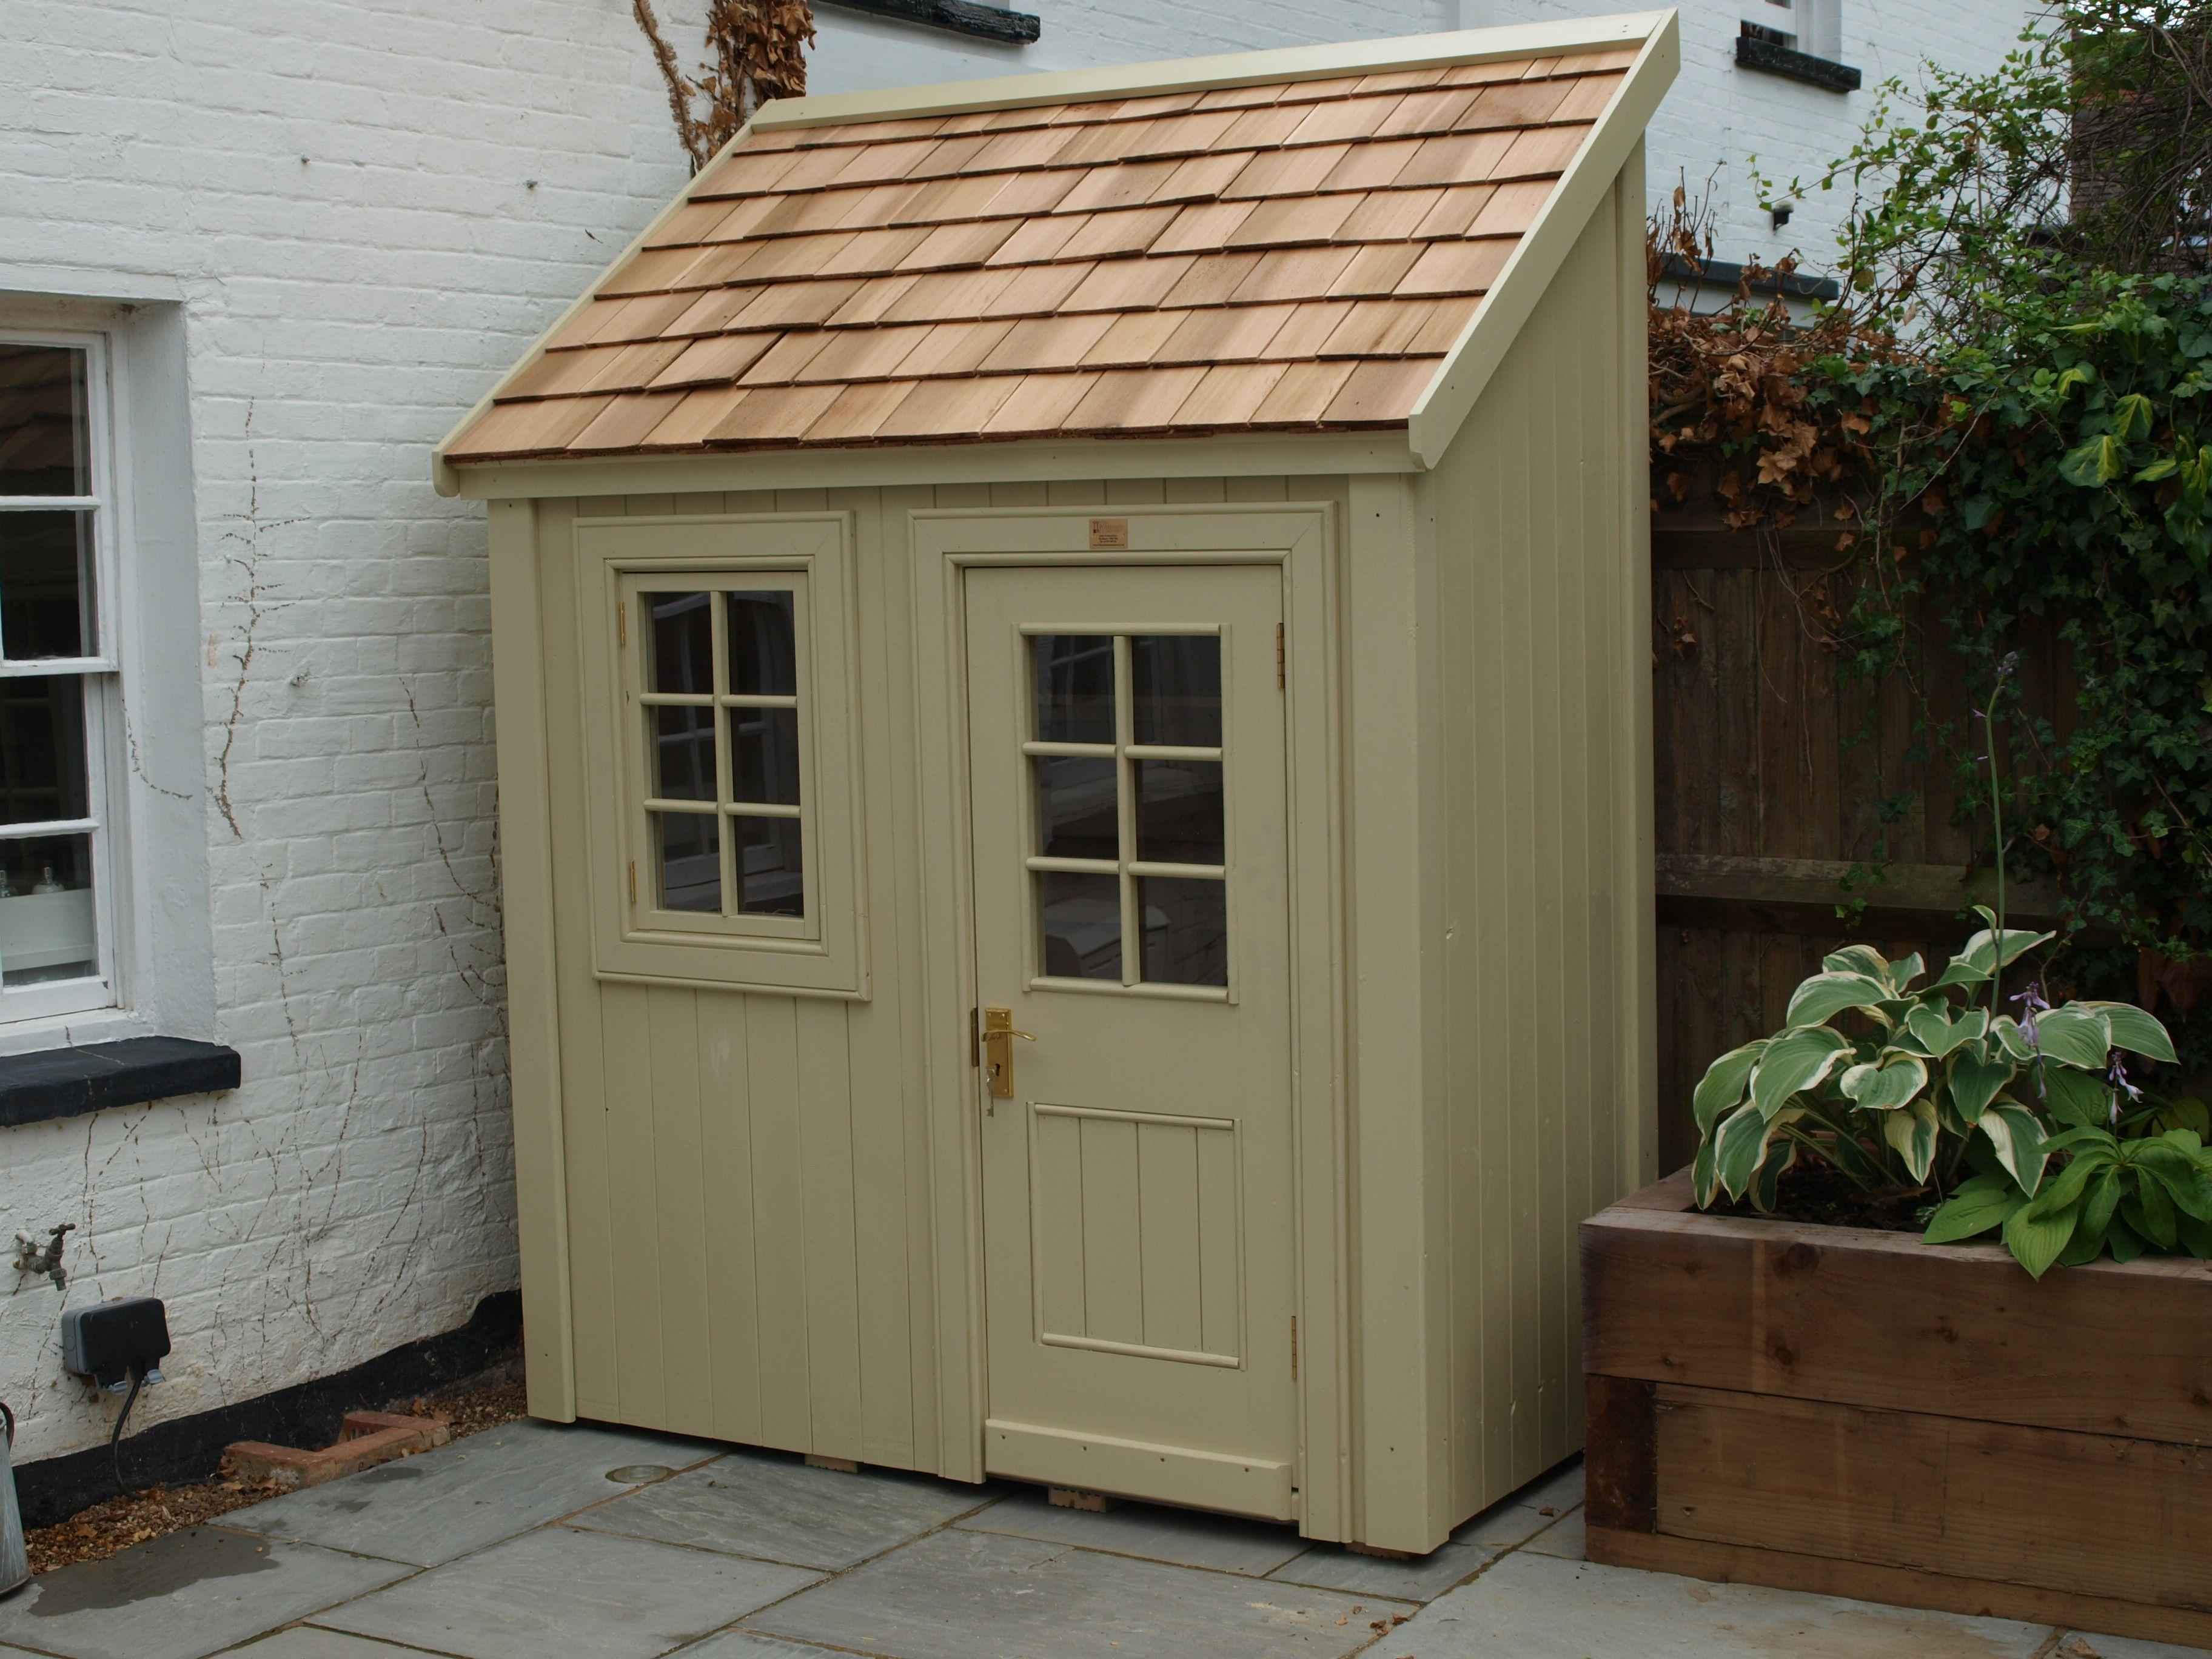 Best A Bespoke Potting Shed With Cedar Shingle Roof And Cedar Shingle Roof Roof Shingles Cedar Roof 640 x 480